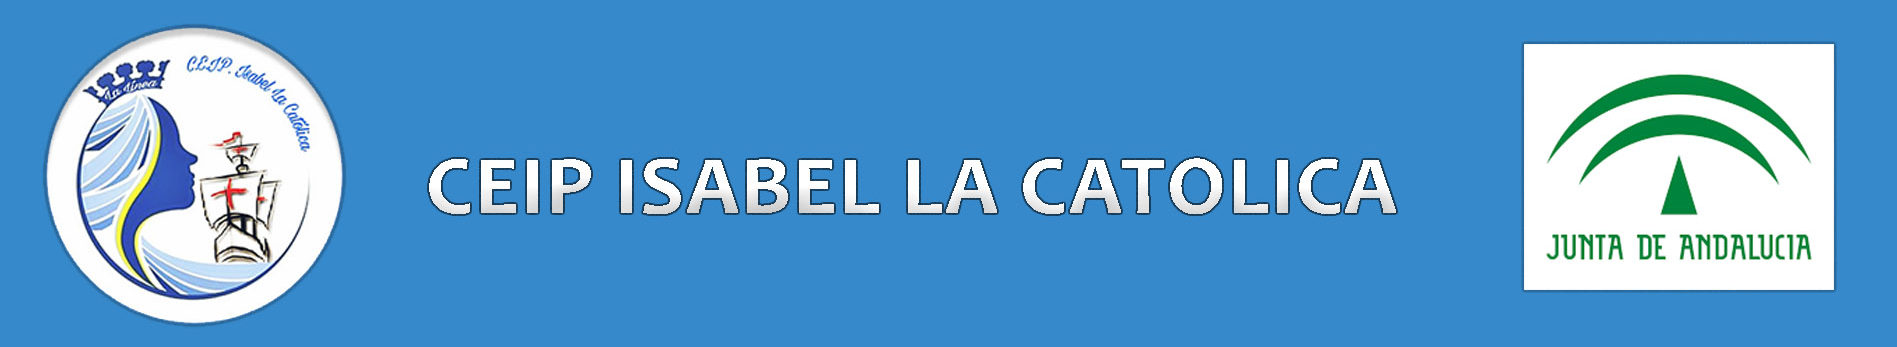 CEIP ISABEL LA CATOLICA